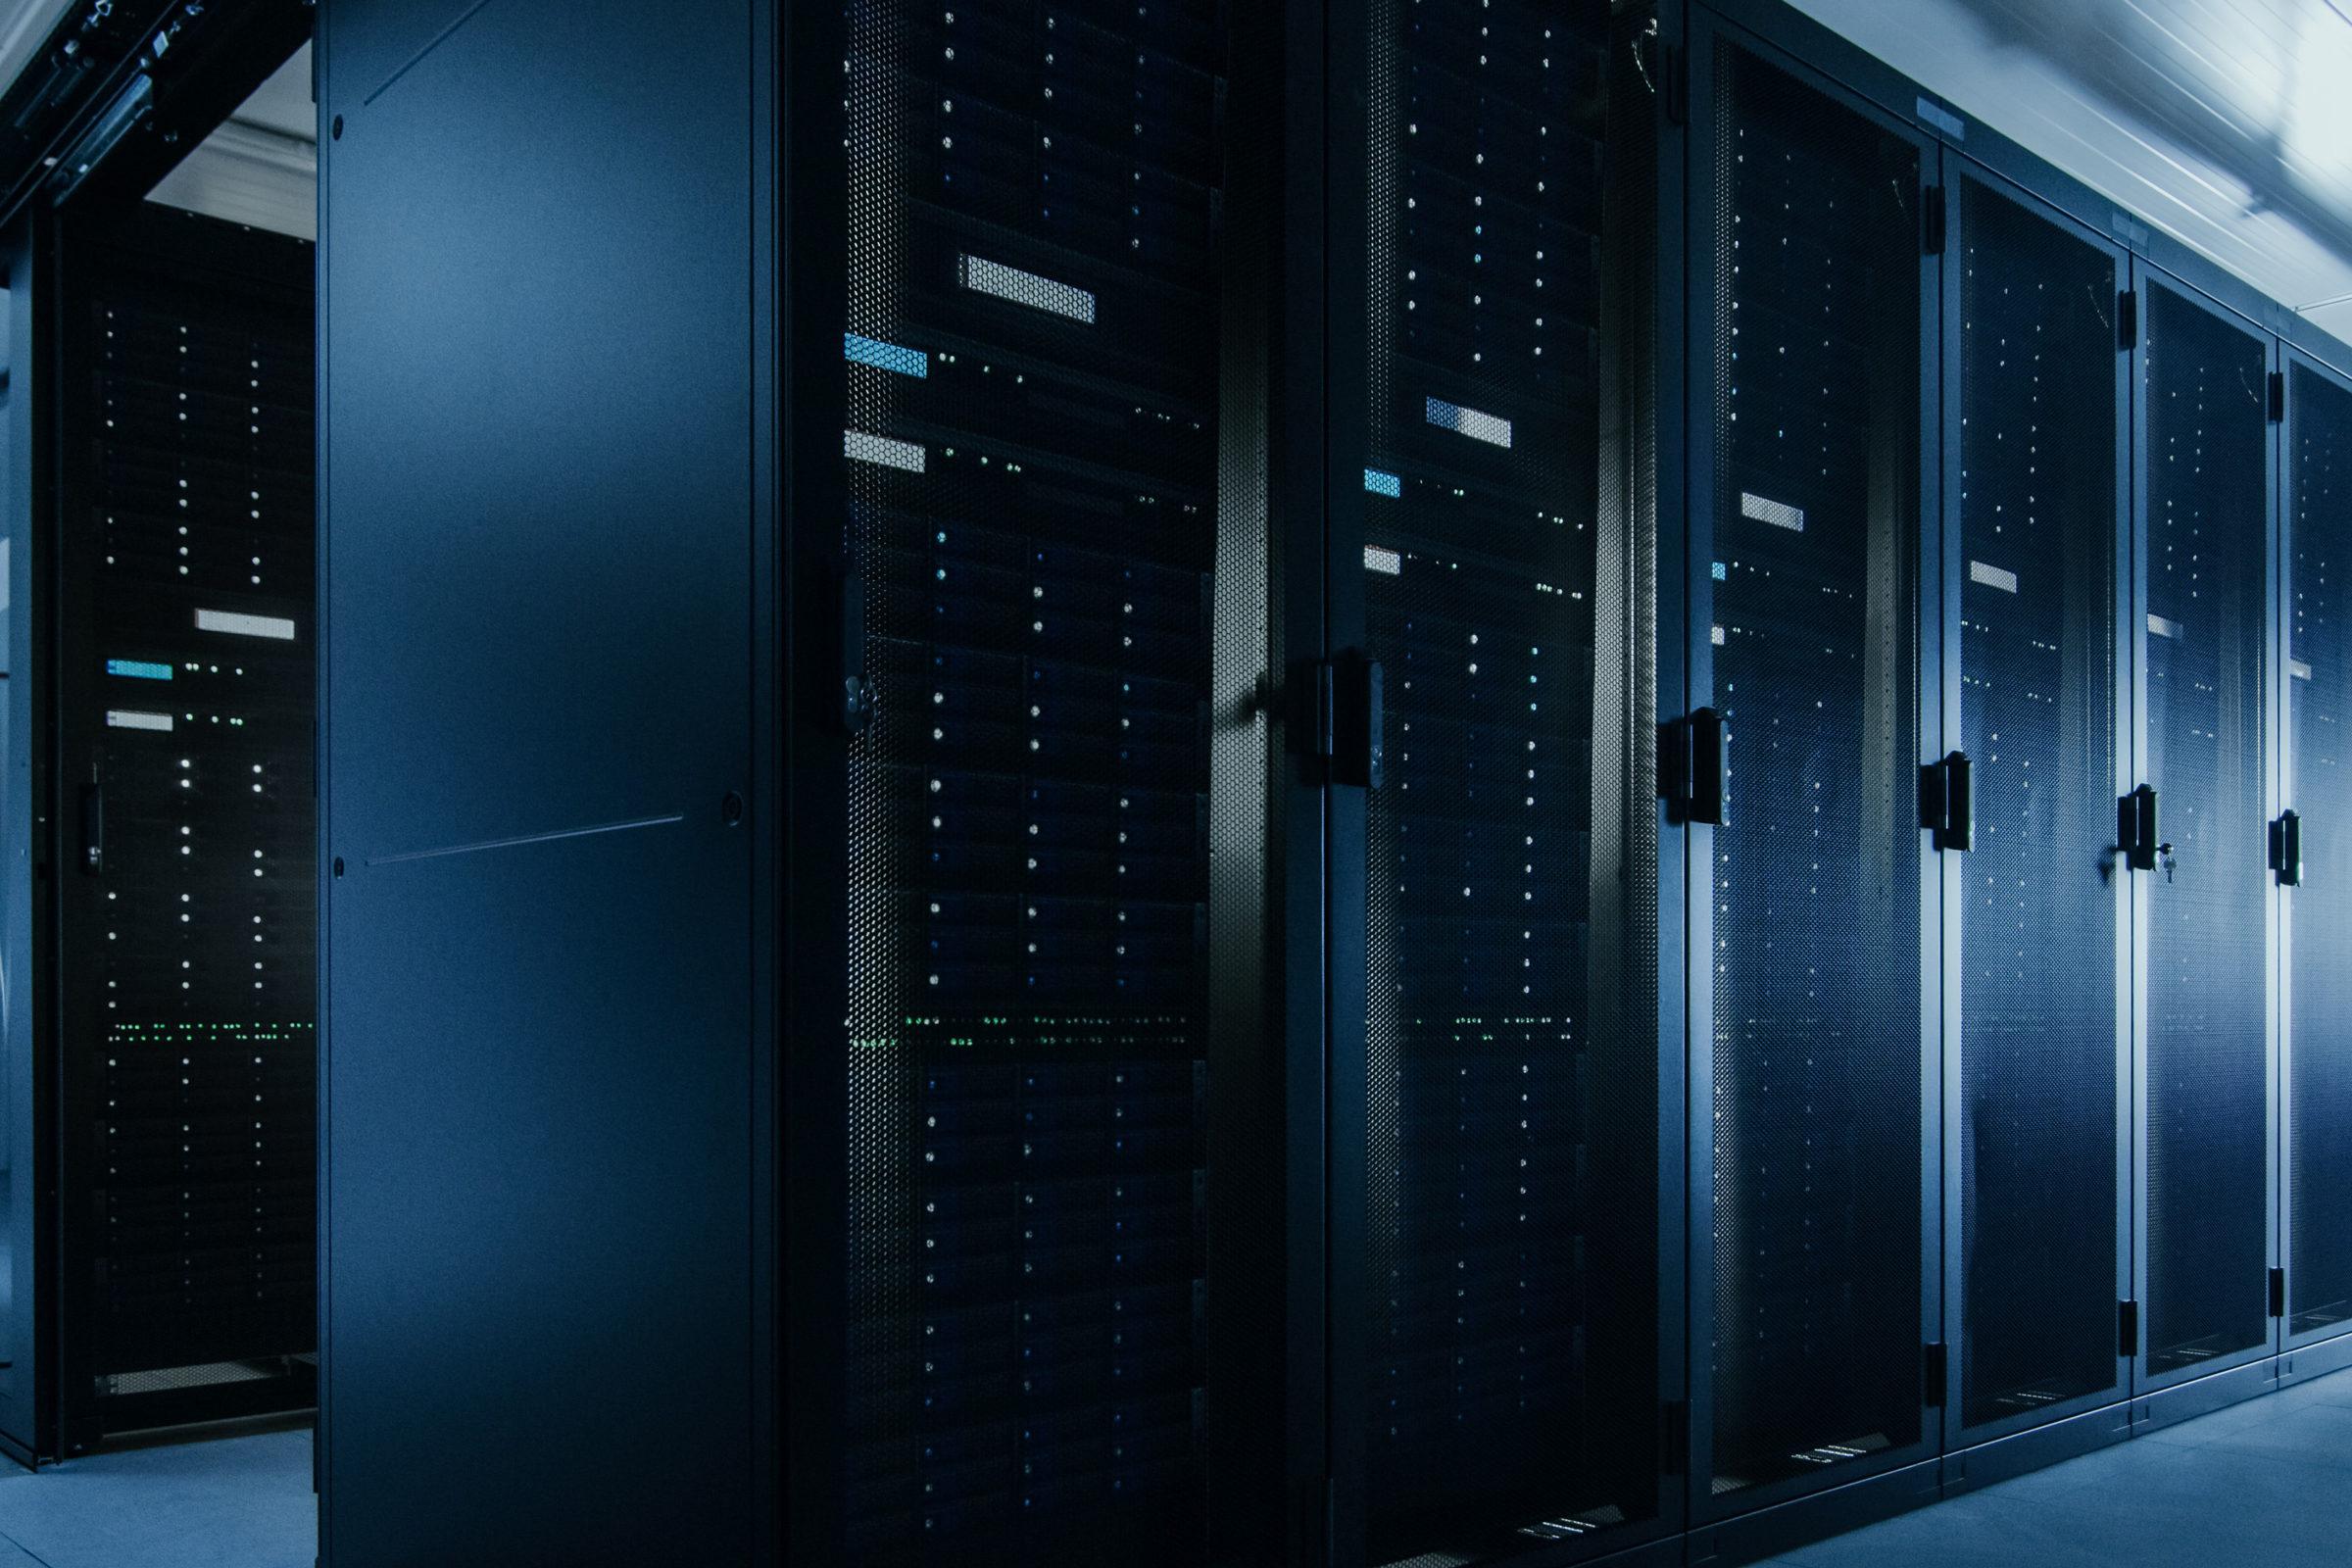 A server rack in a data center